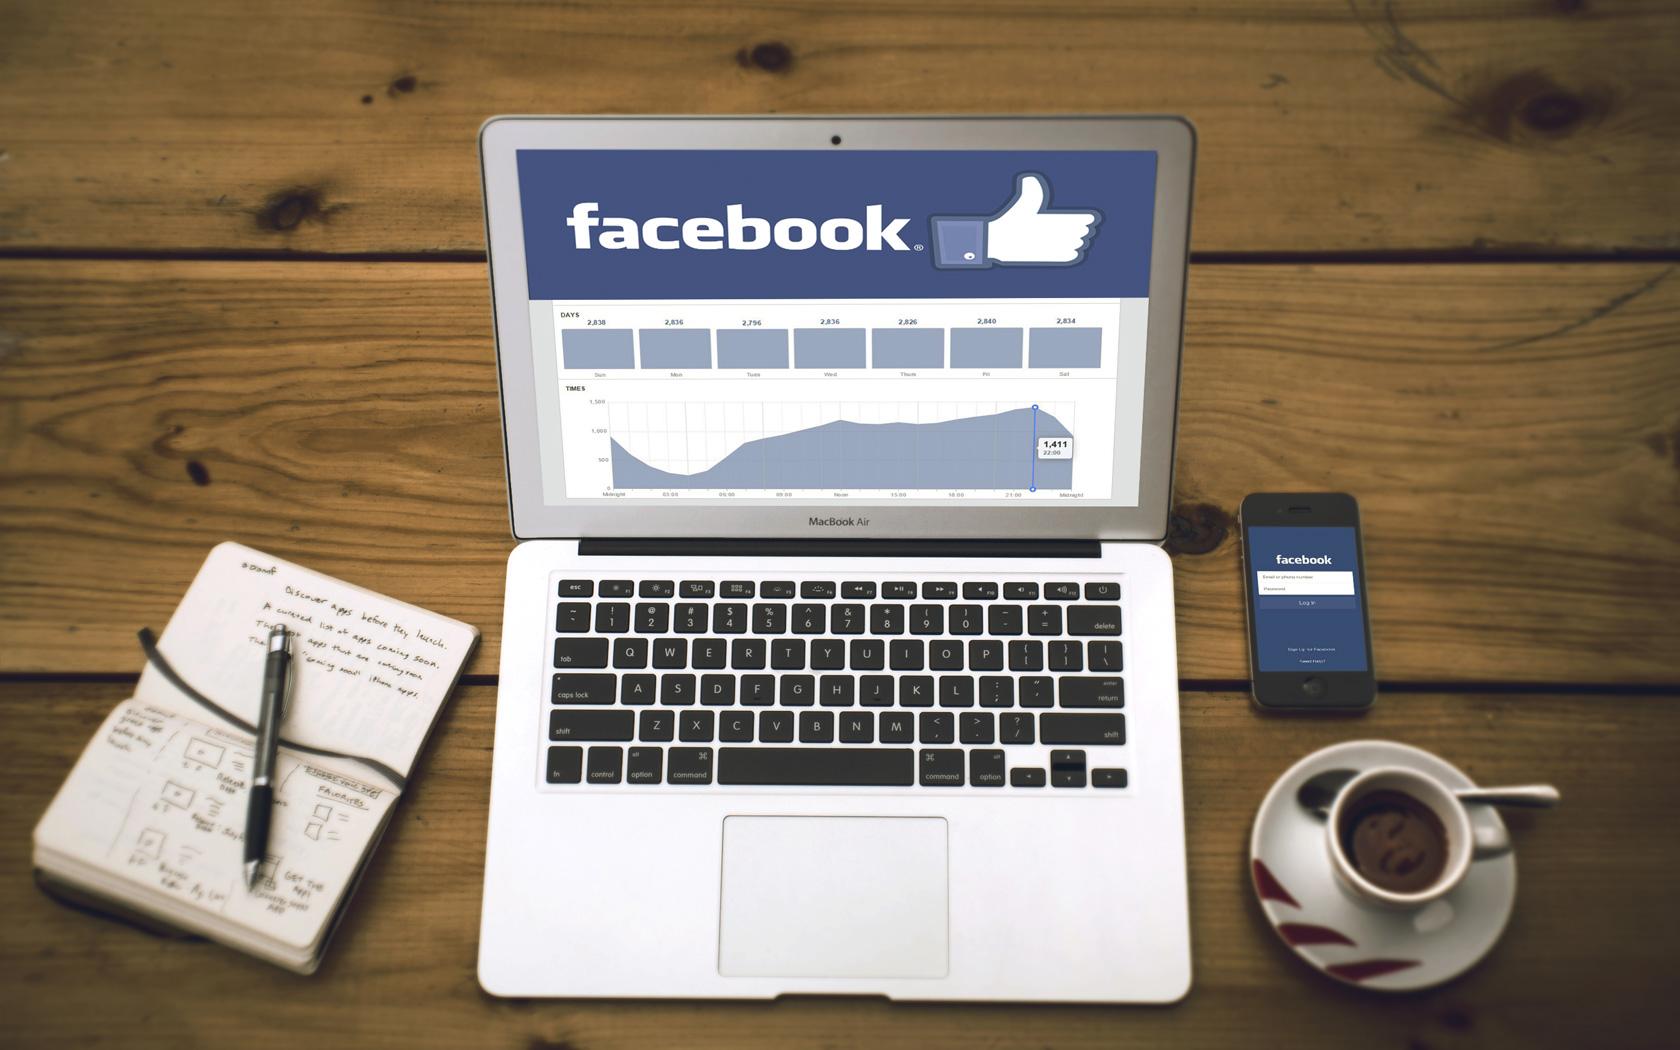 marketing and facebook [ebook gratuito] marketing no facebook - aprenda tudo sobre o assunto e descubra como utilizar o facebook para obter bons resultados.